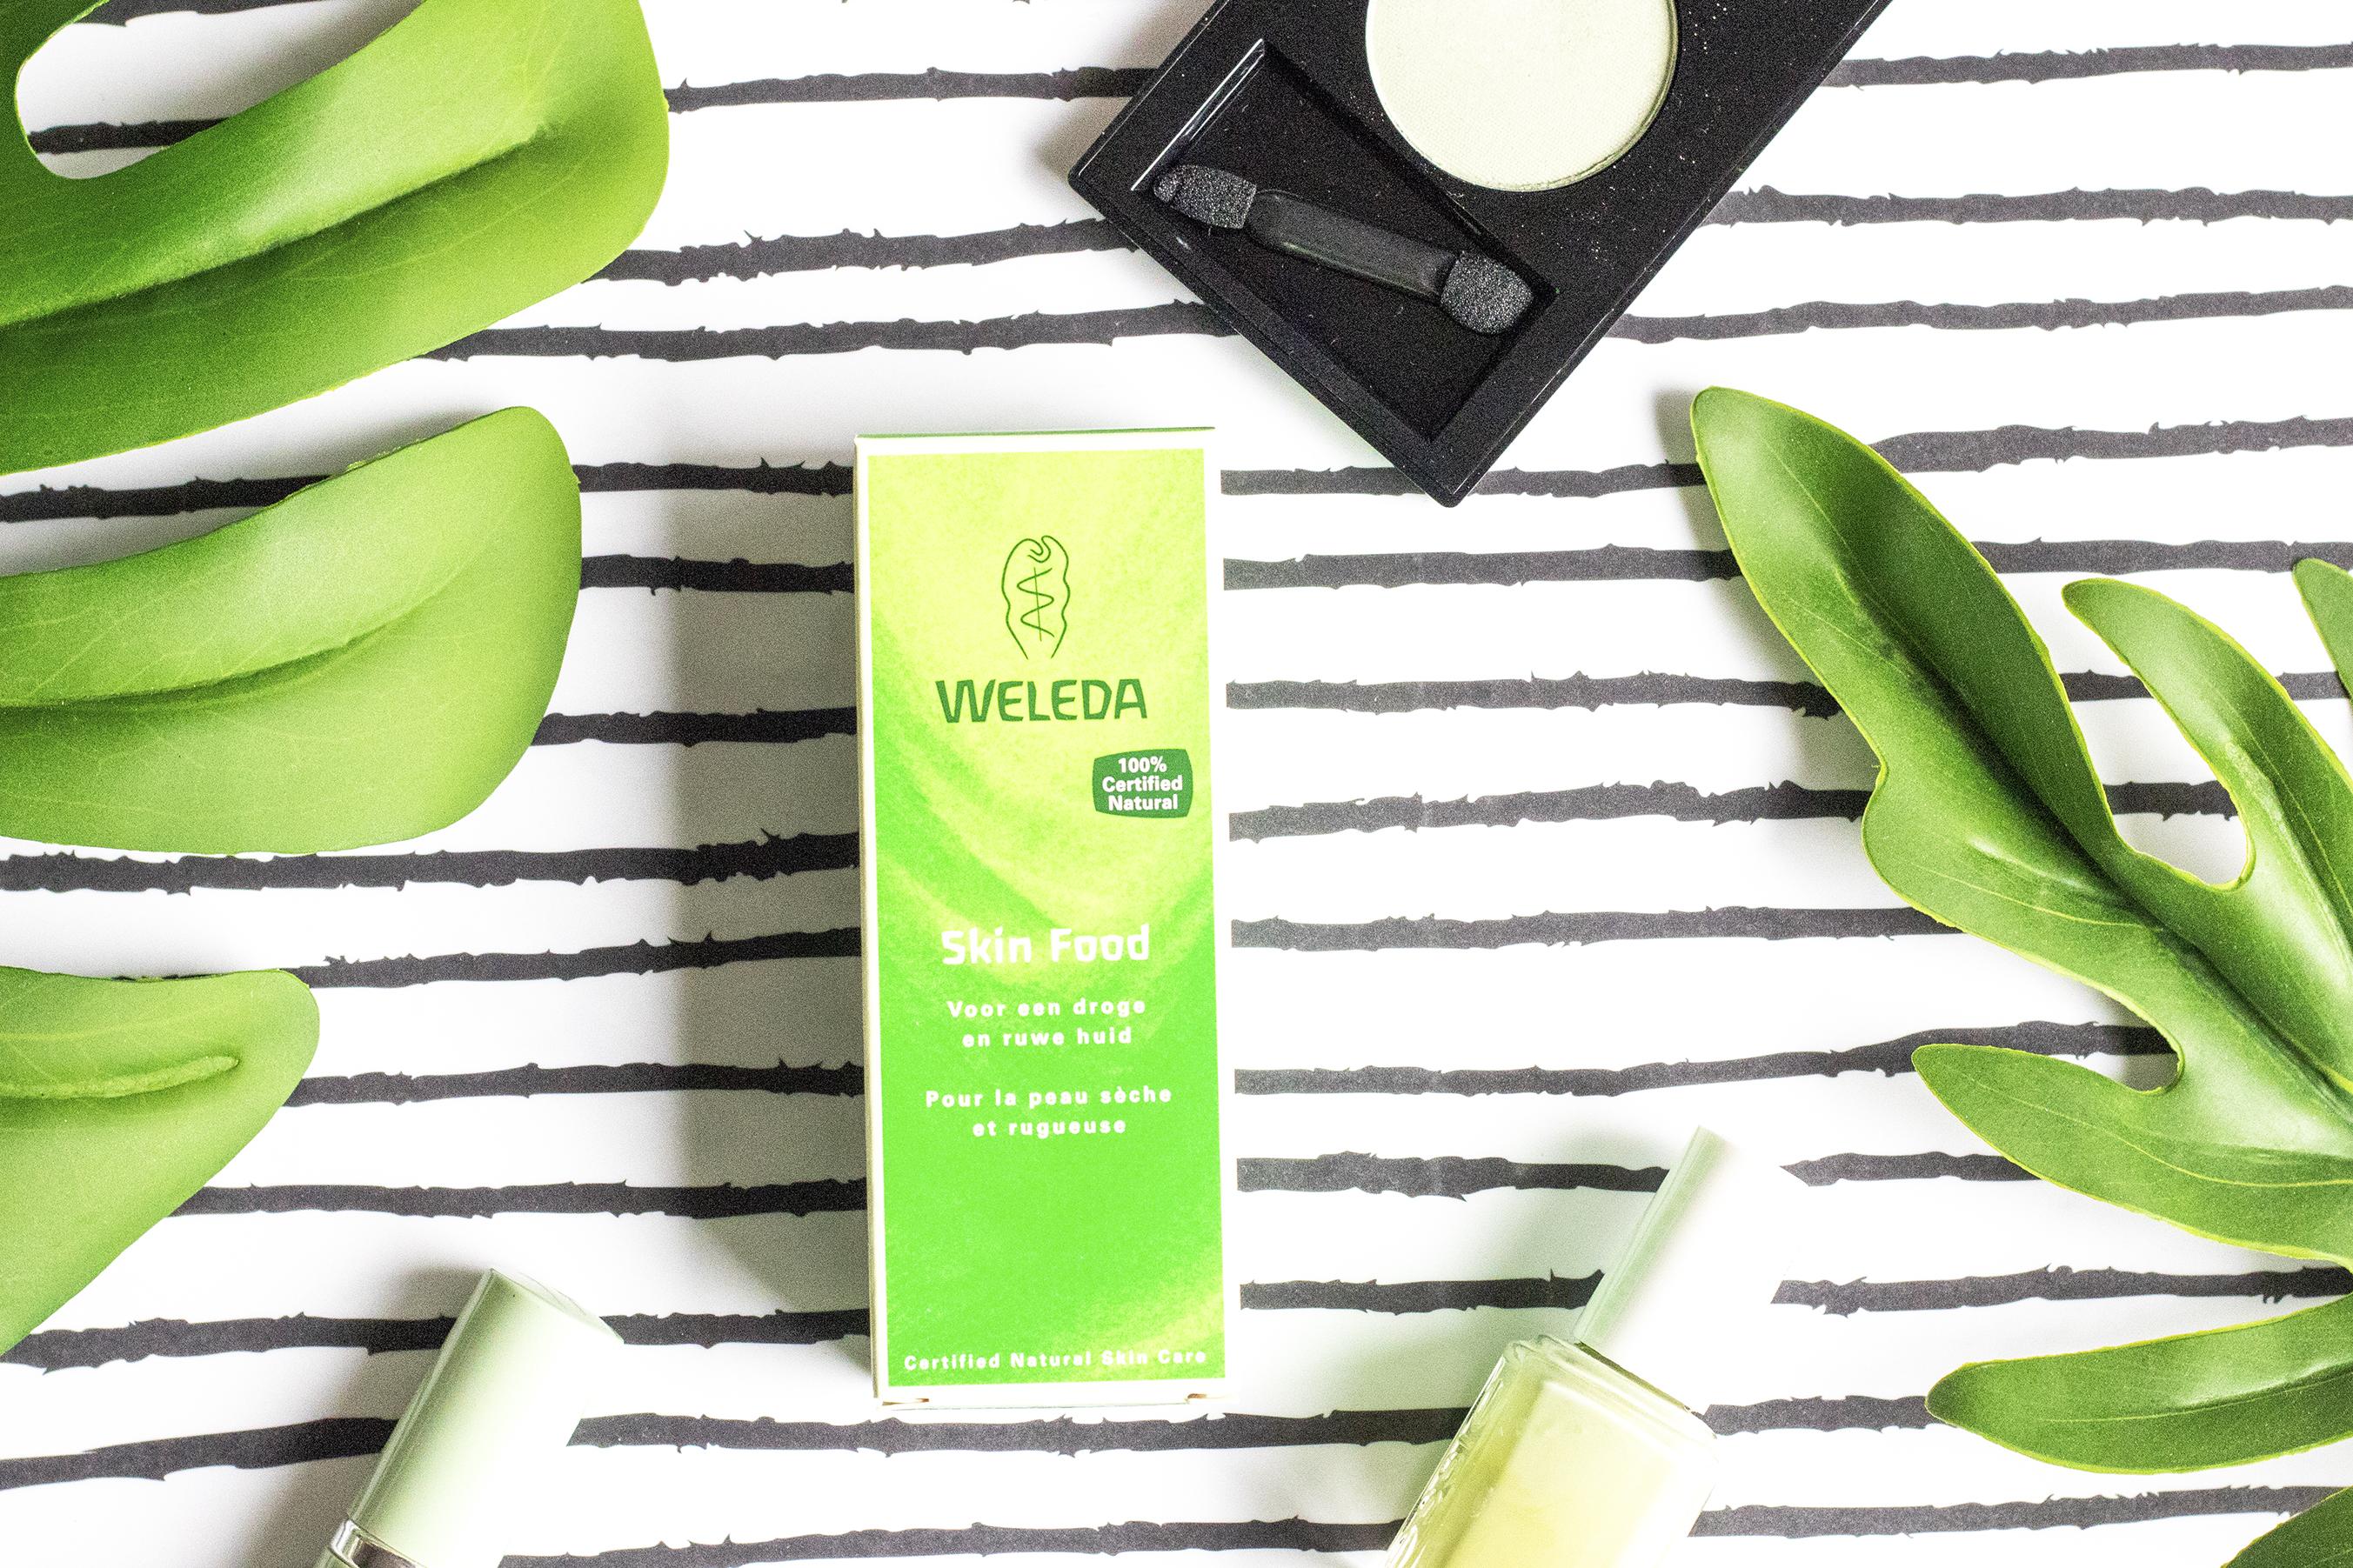 skin food weleda review